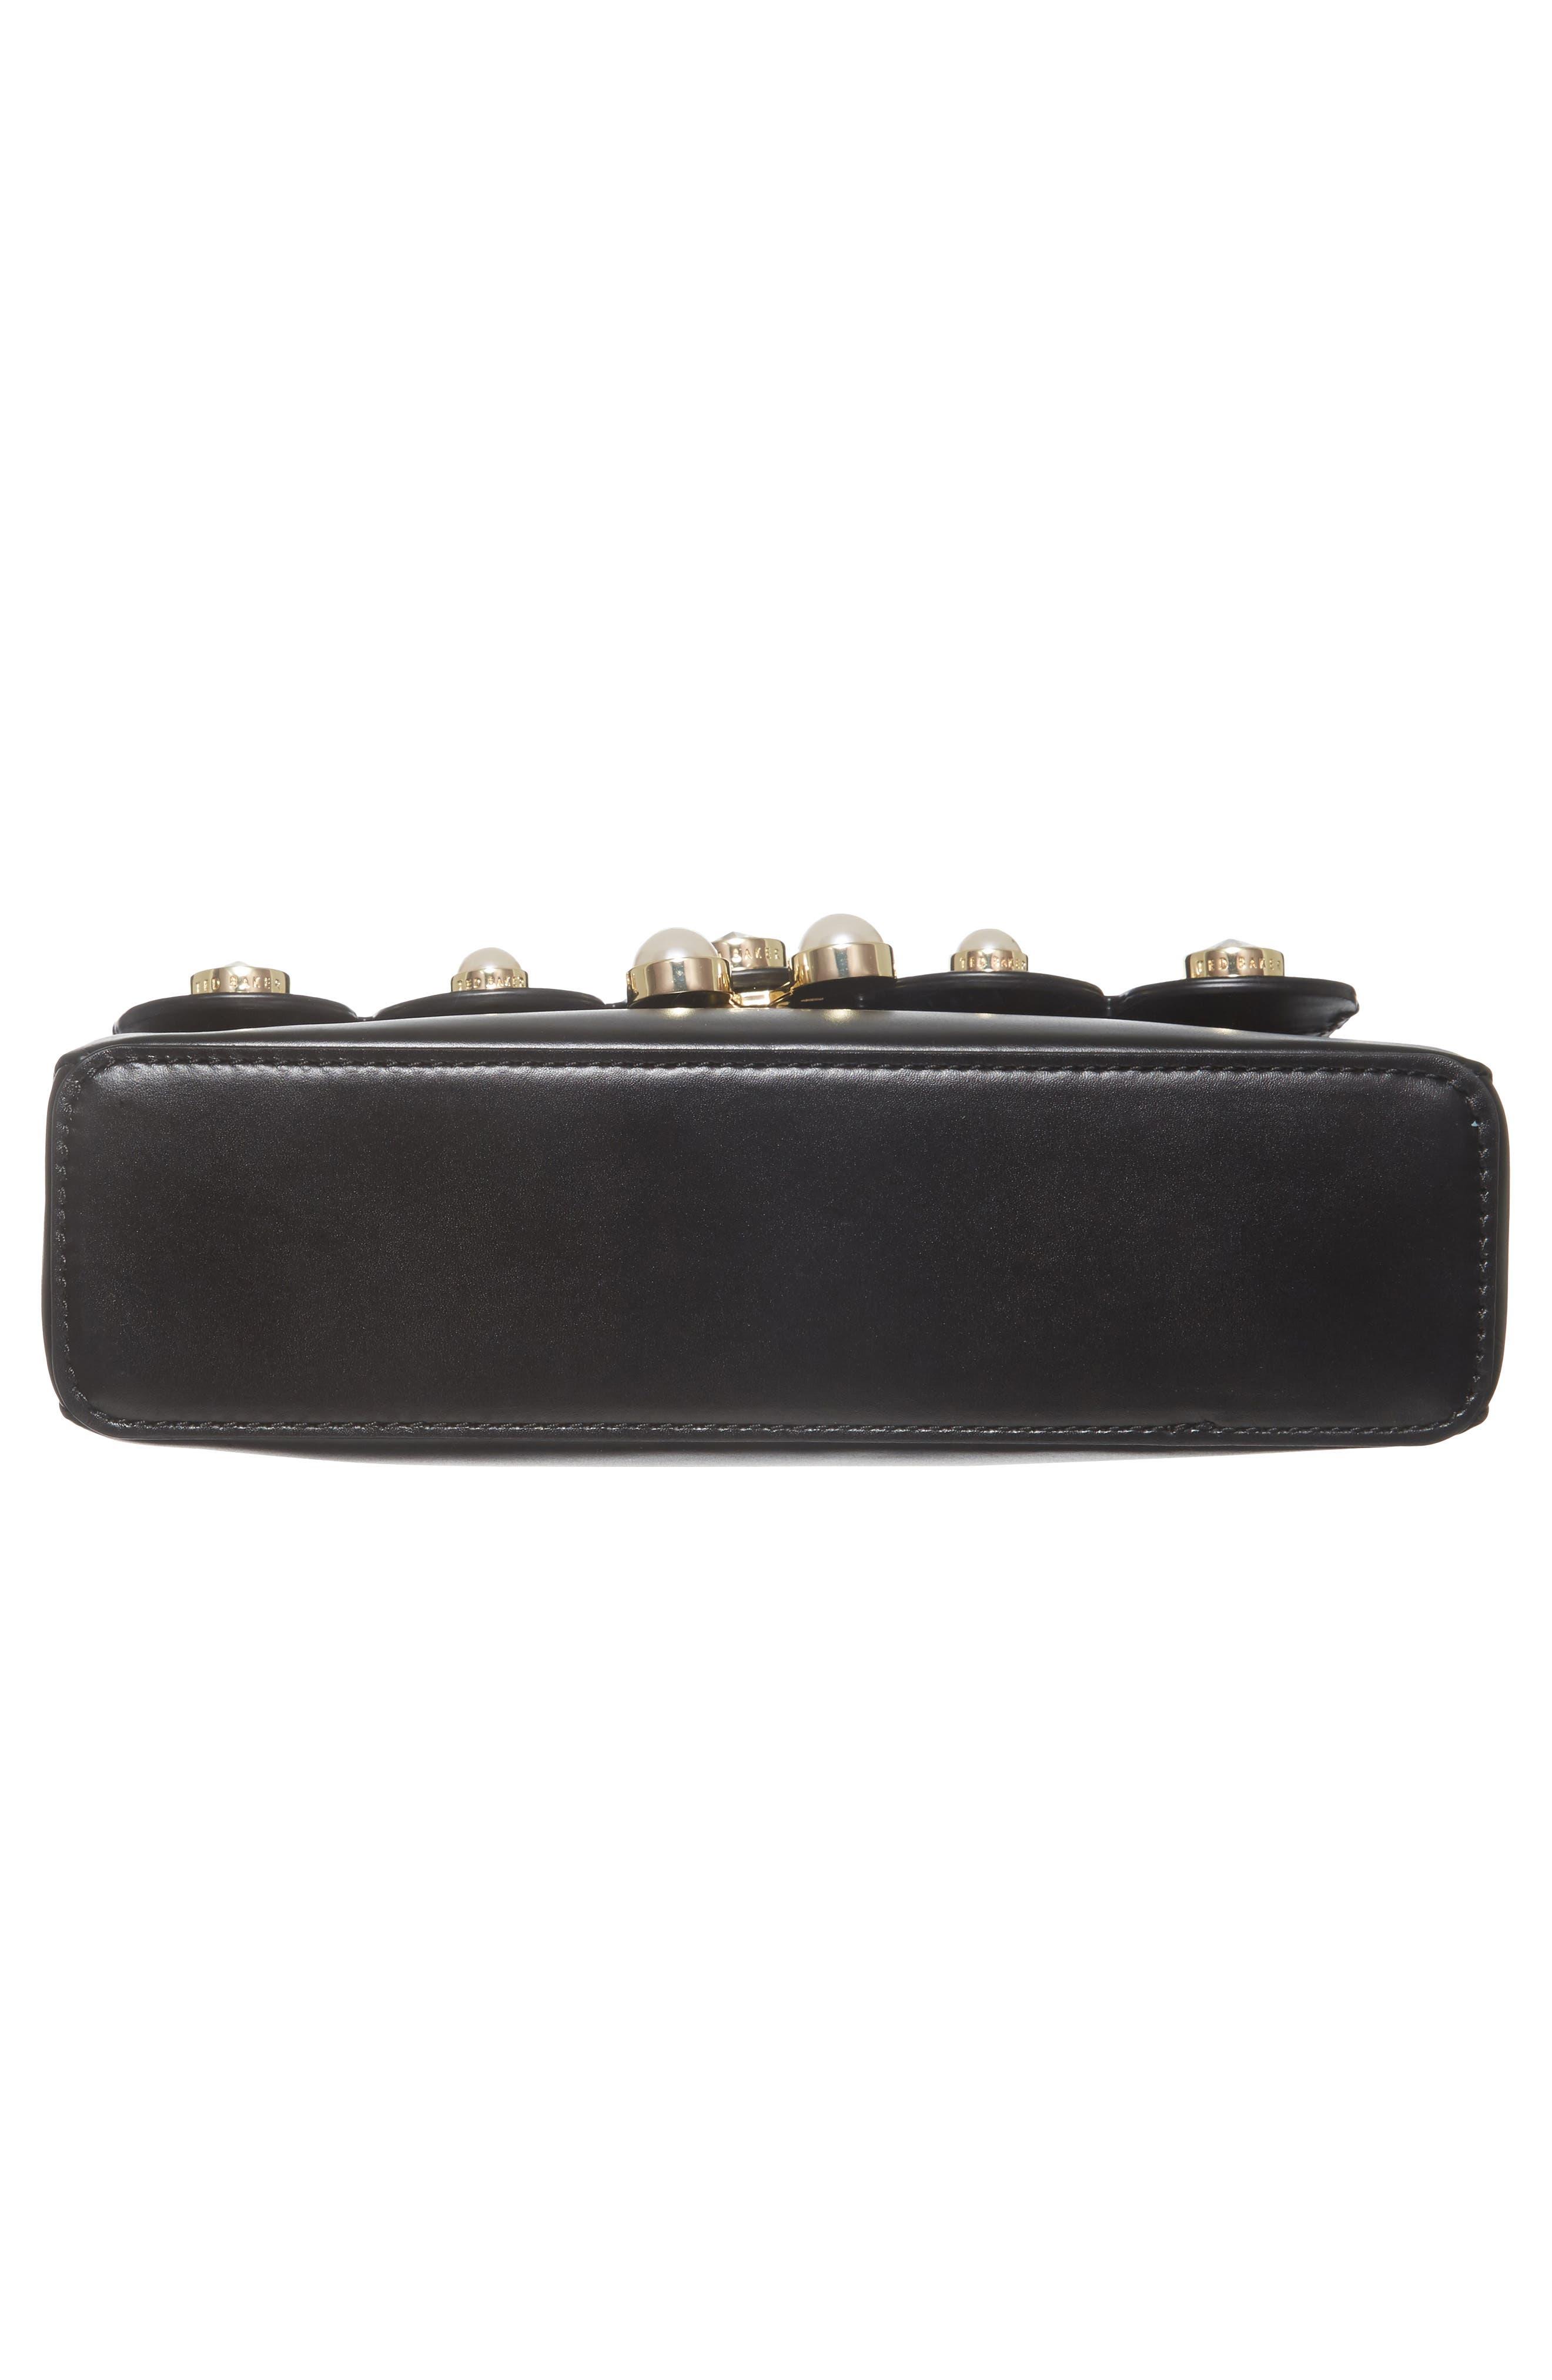 Saraa Leather Crossbody Bag,                             Alternate thumbnail 5, color,                             Black